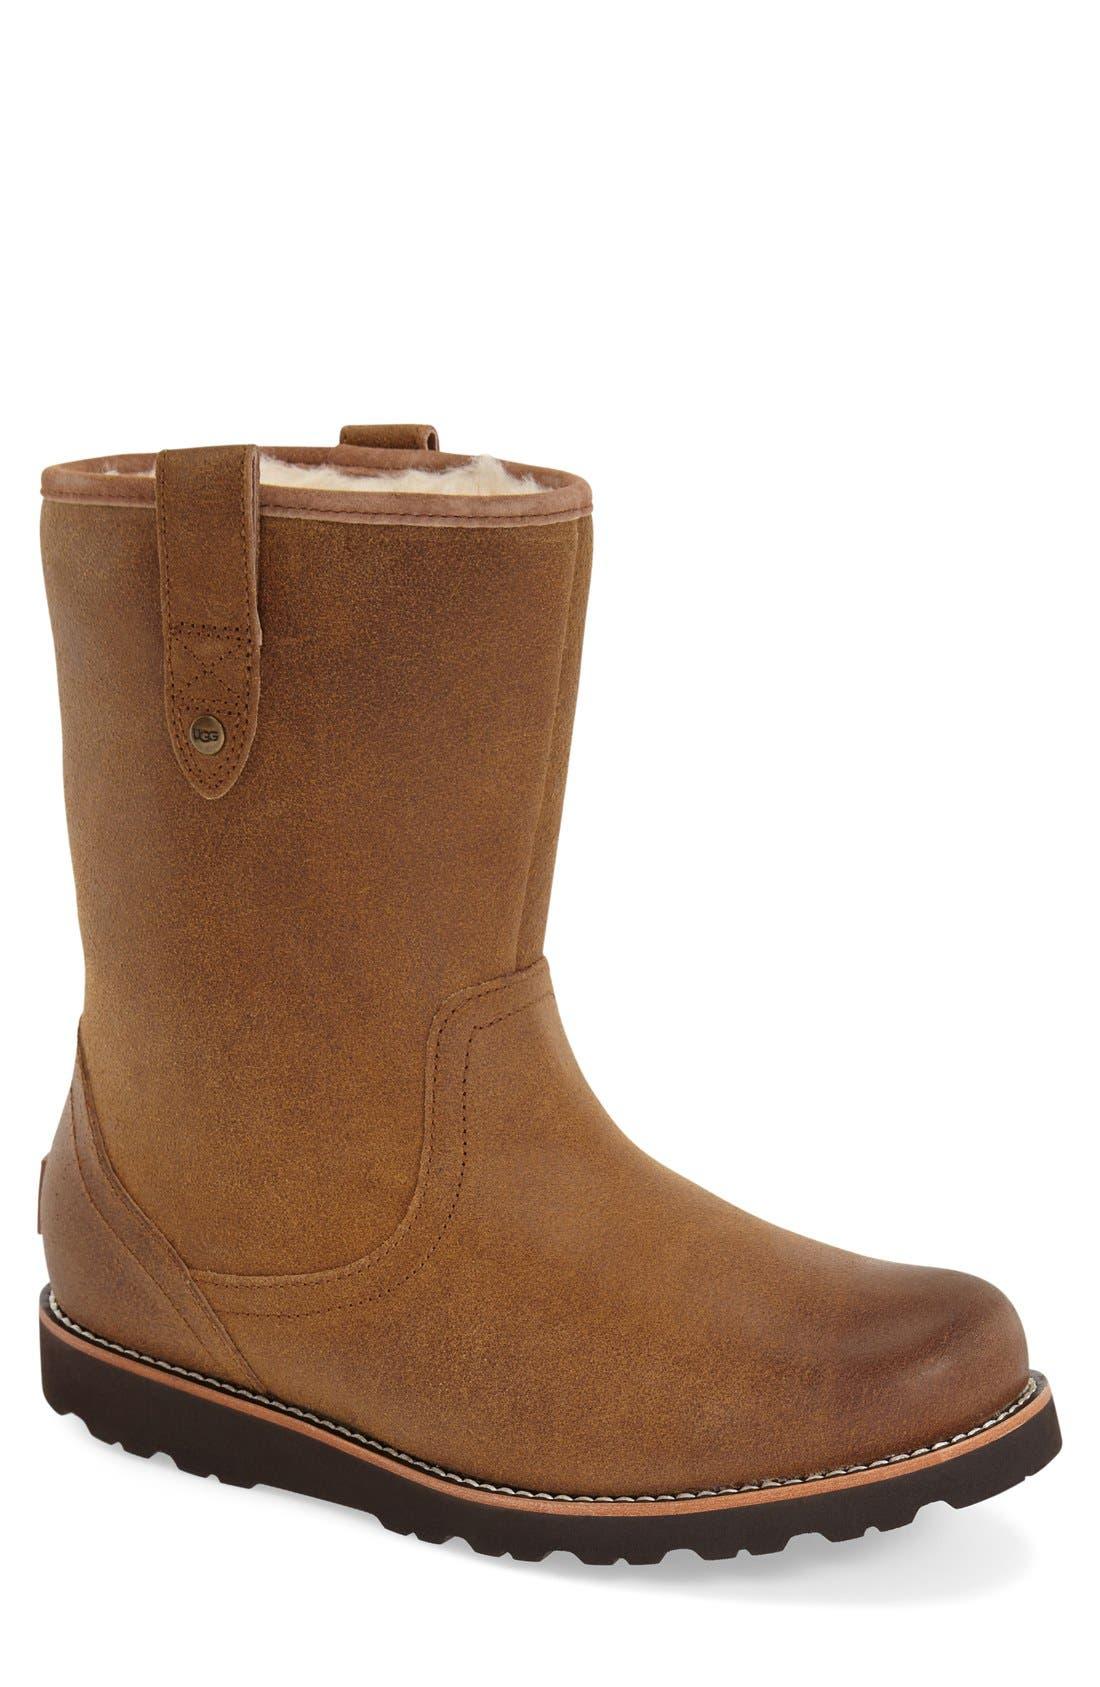 Stoneman Waterproof Boot,                         Main,                         color, 219